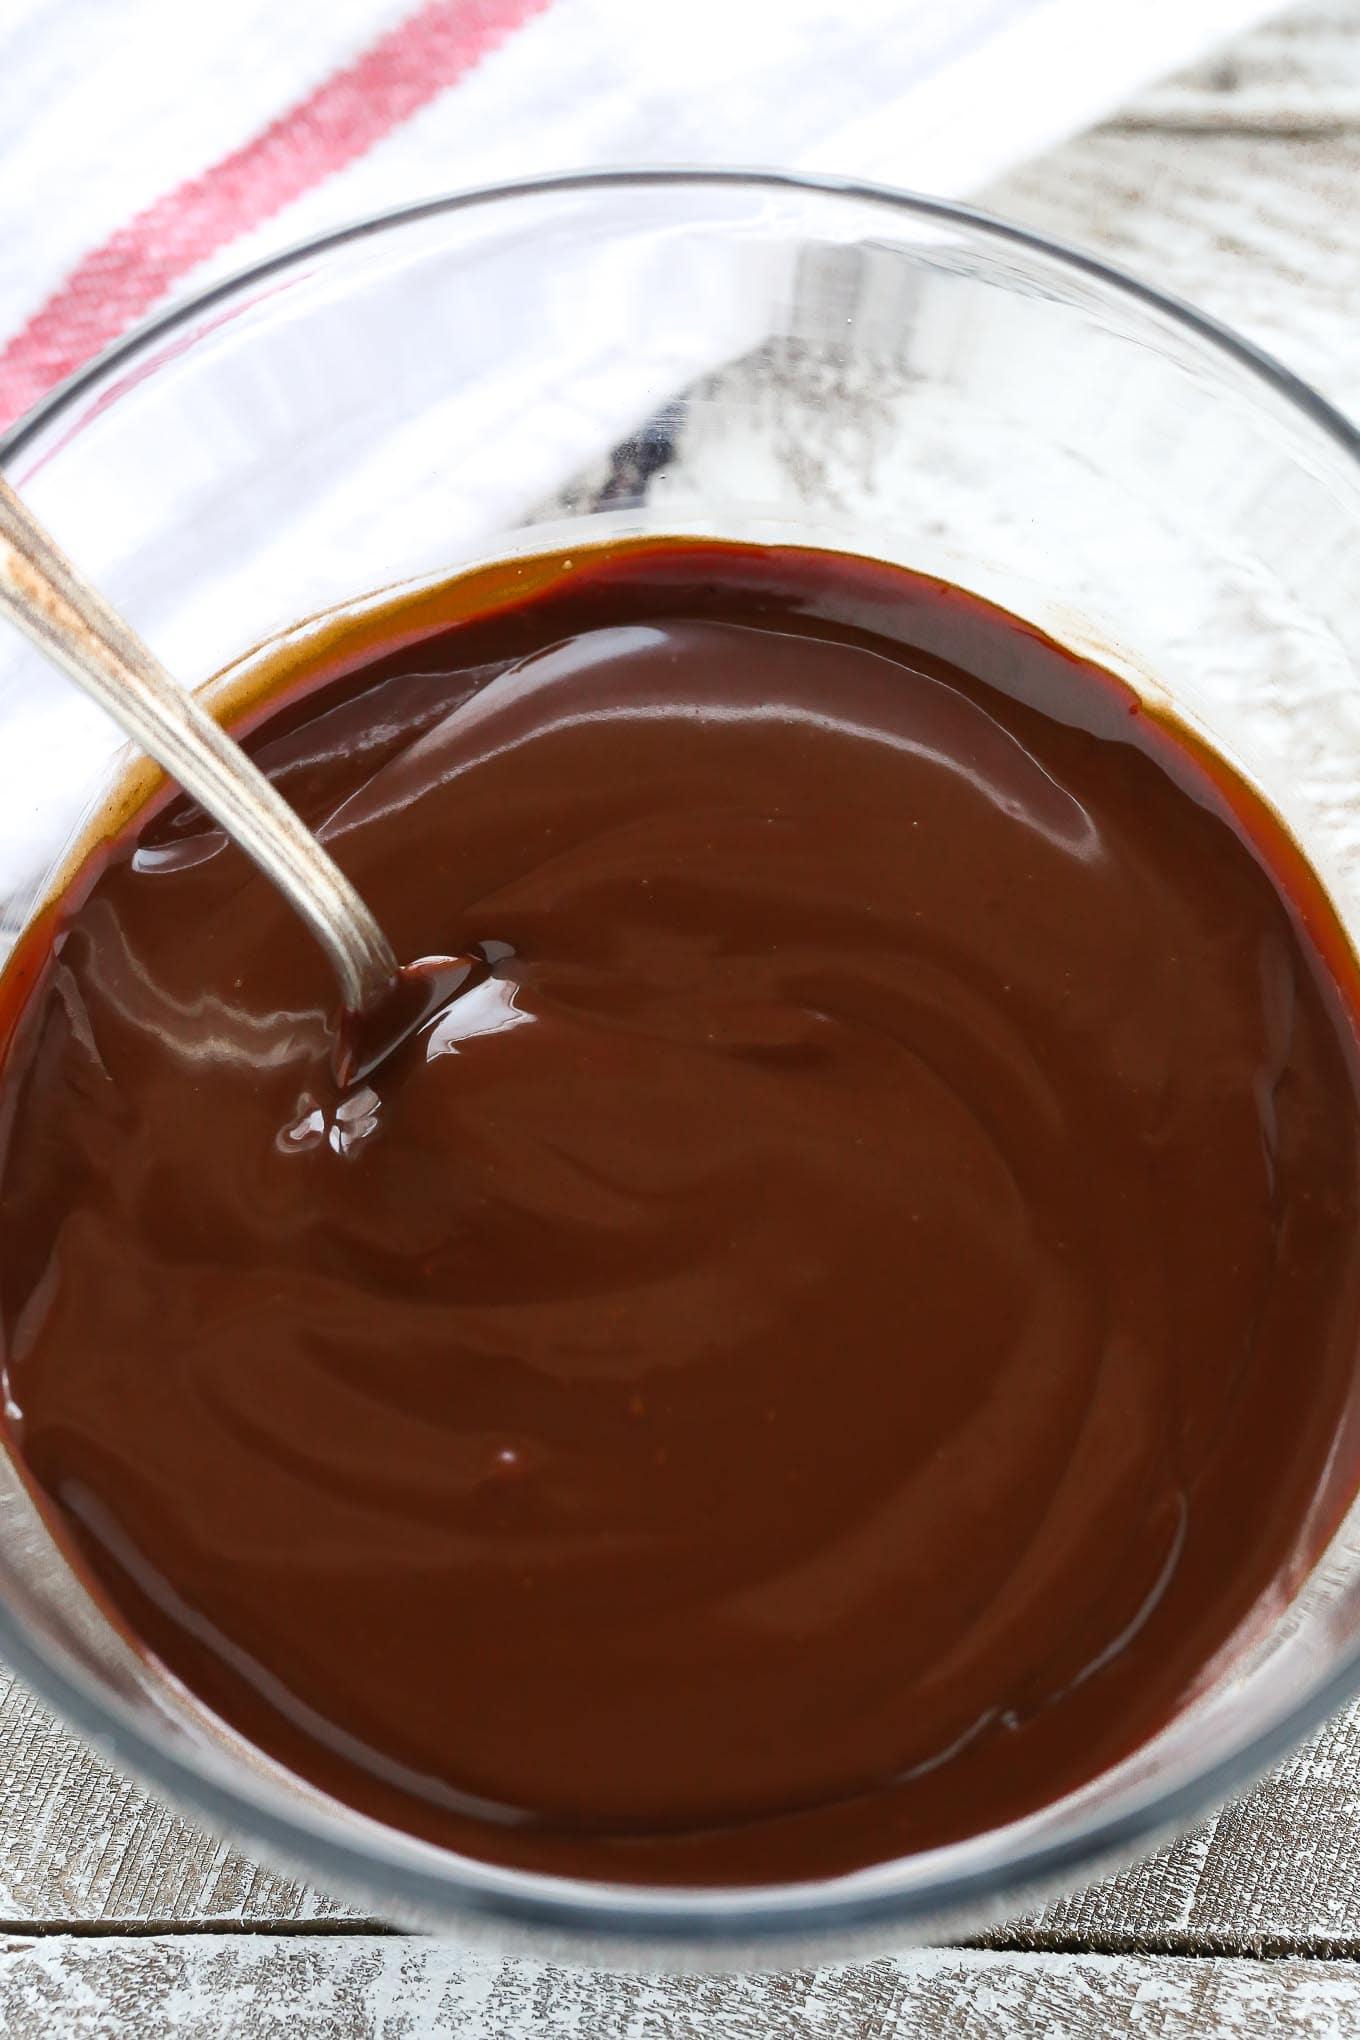 How to make chocolate ganache with single cream